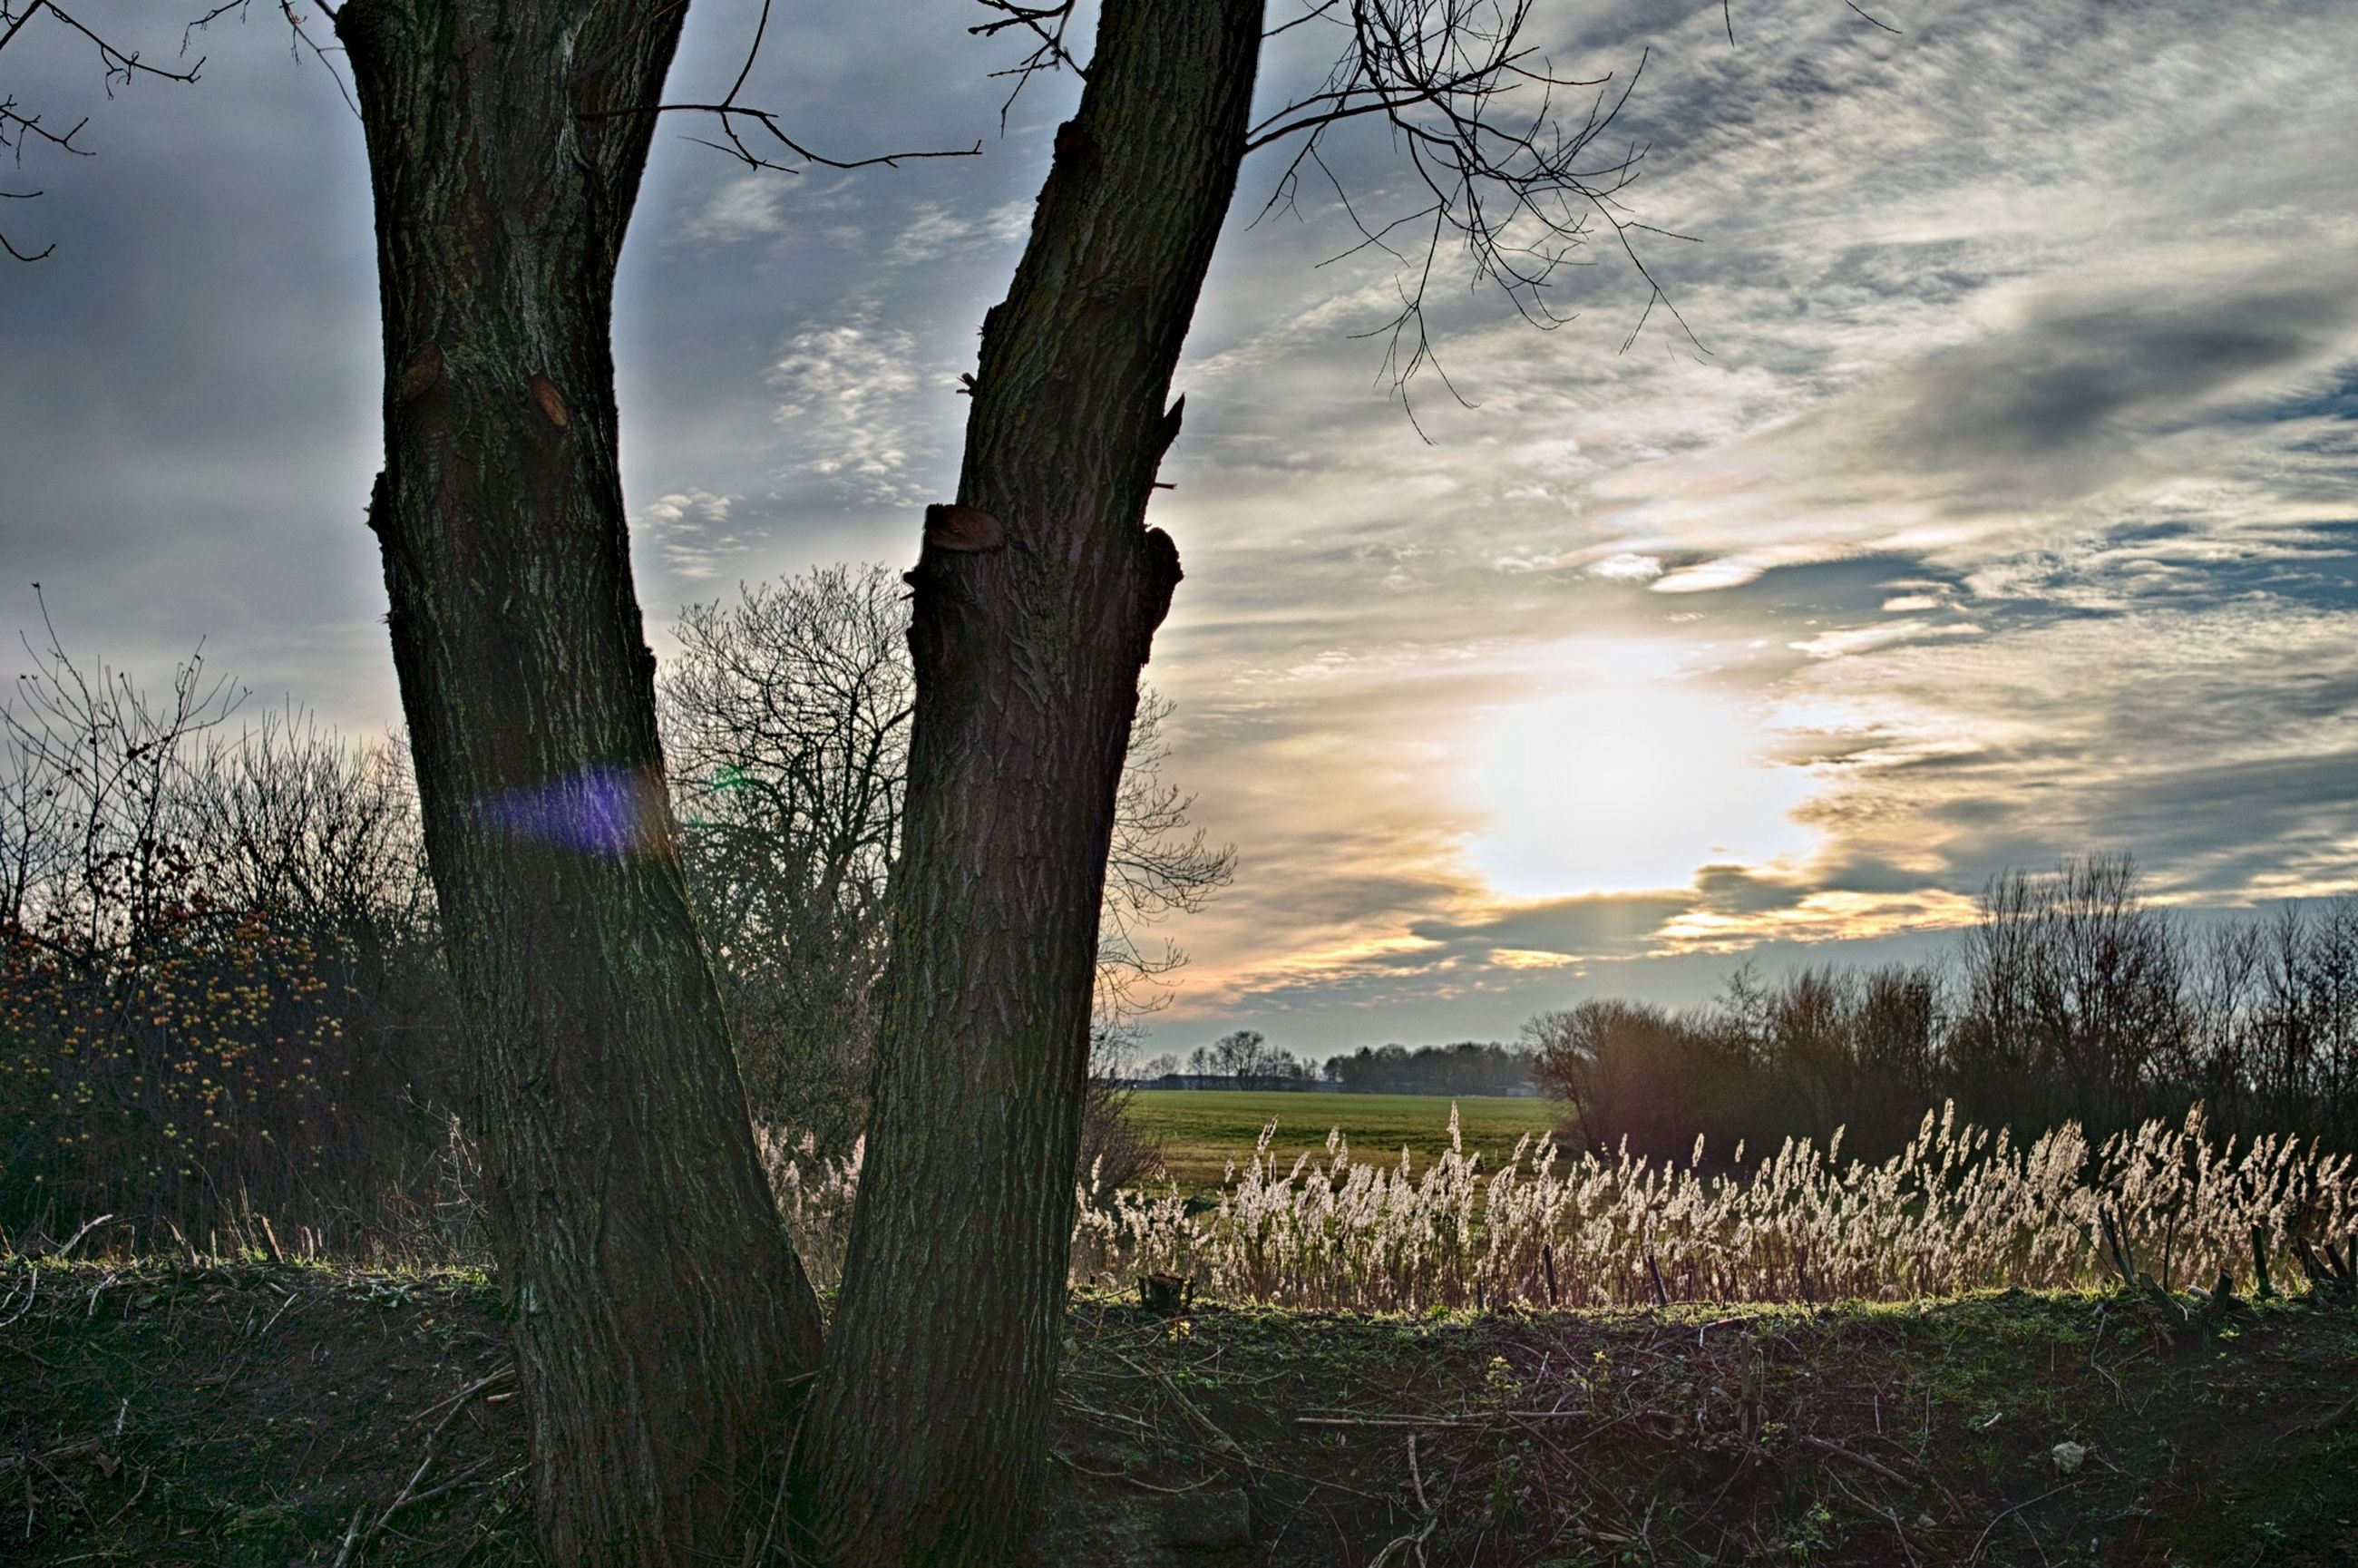 sky, tranquility, field, tranquil scene, tree, grass, nature, scenics, beauty in nature, landscape, sun, growth, bare tree, sunset, cloud - sky, tree trunk, branch, sunlight, plant, idyllic